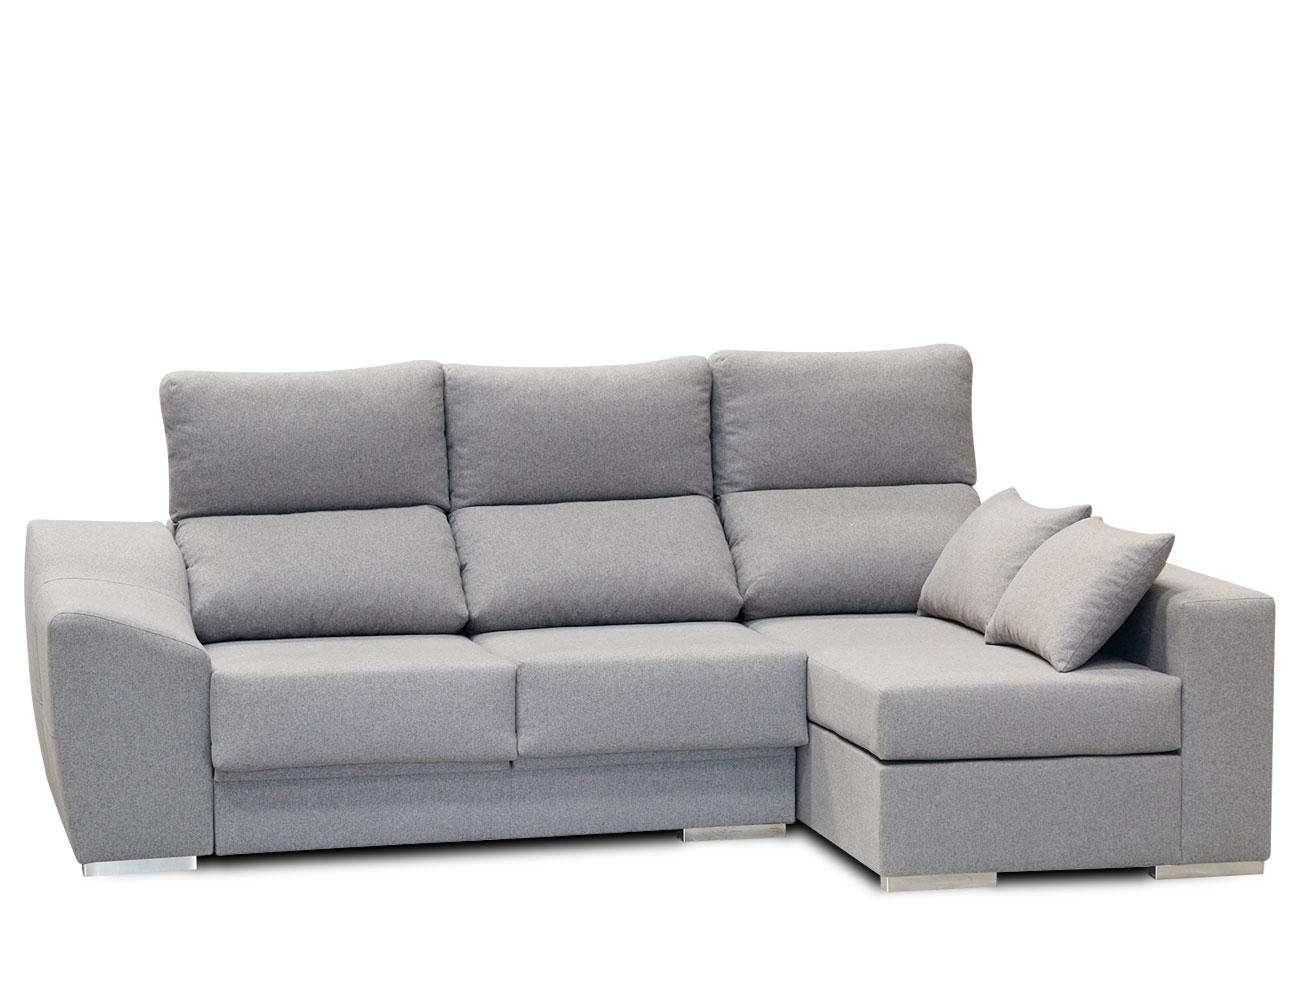 Sofa chaiselongue moderno gris 6